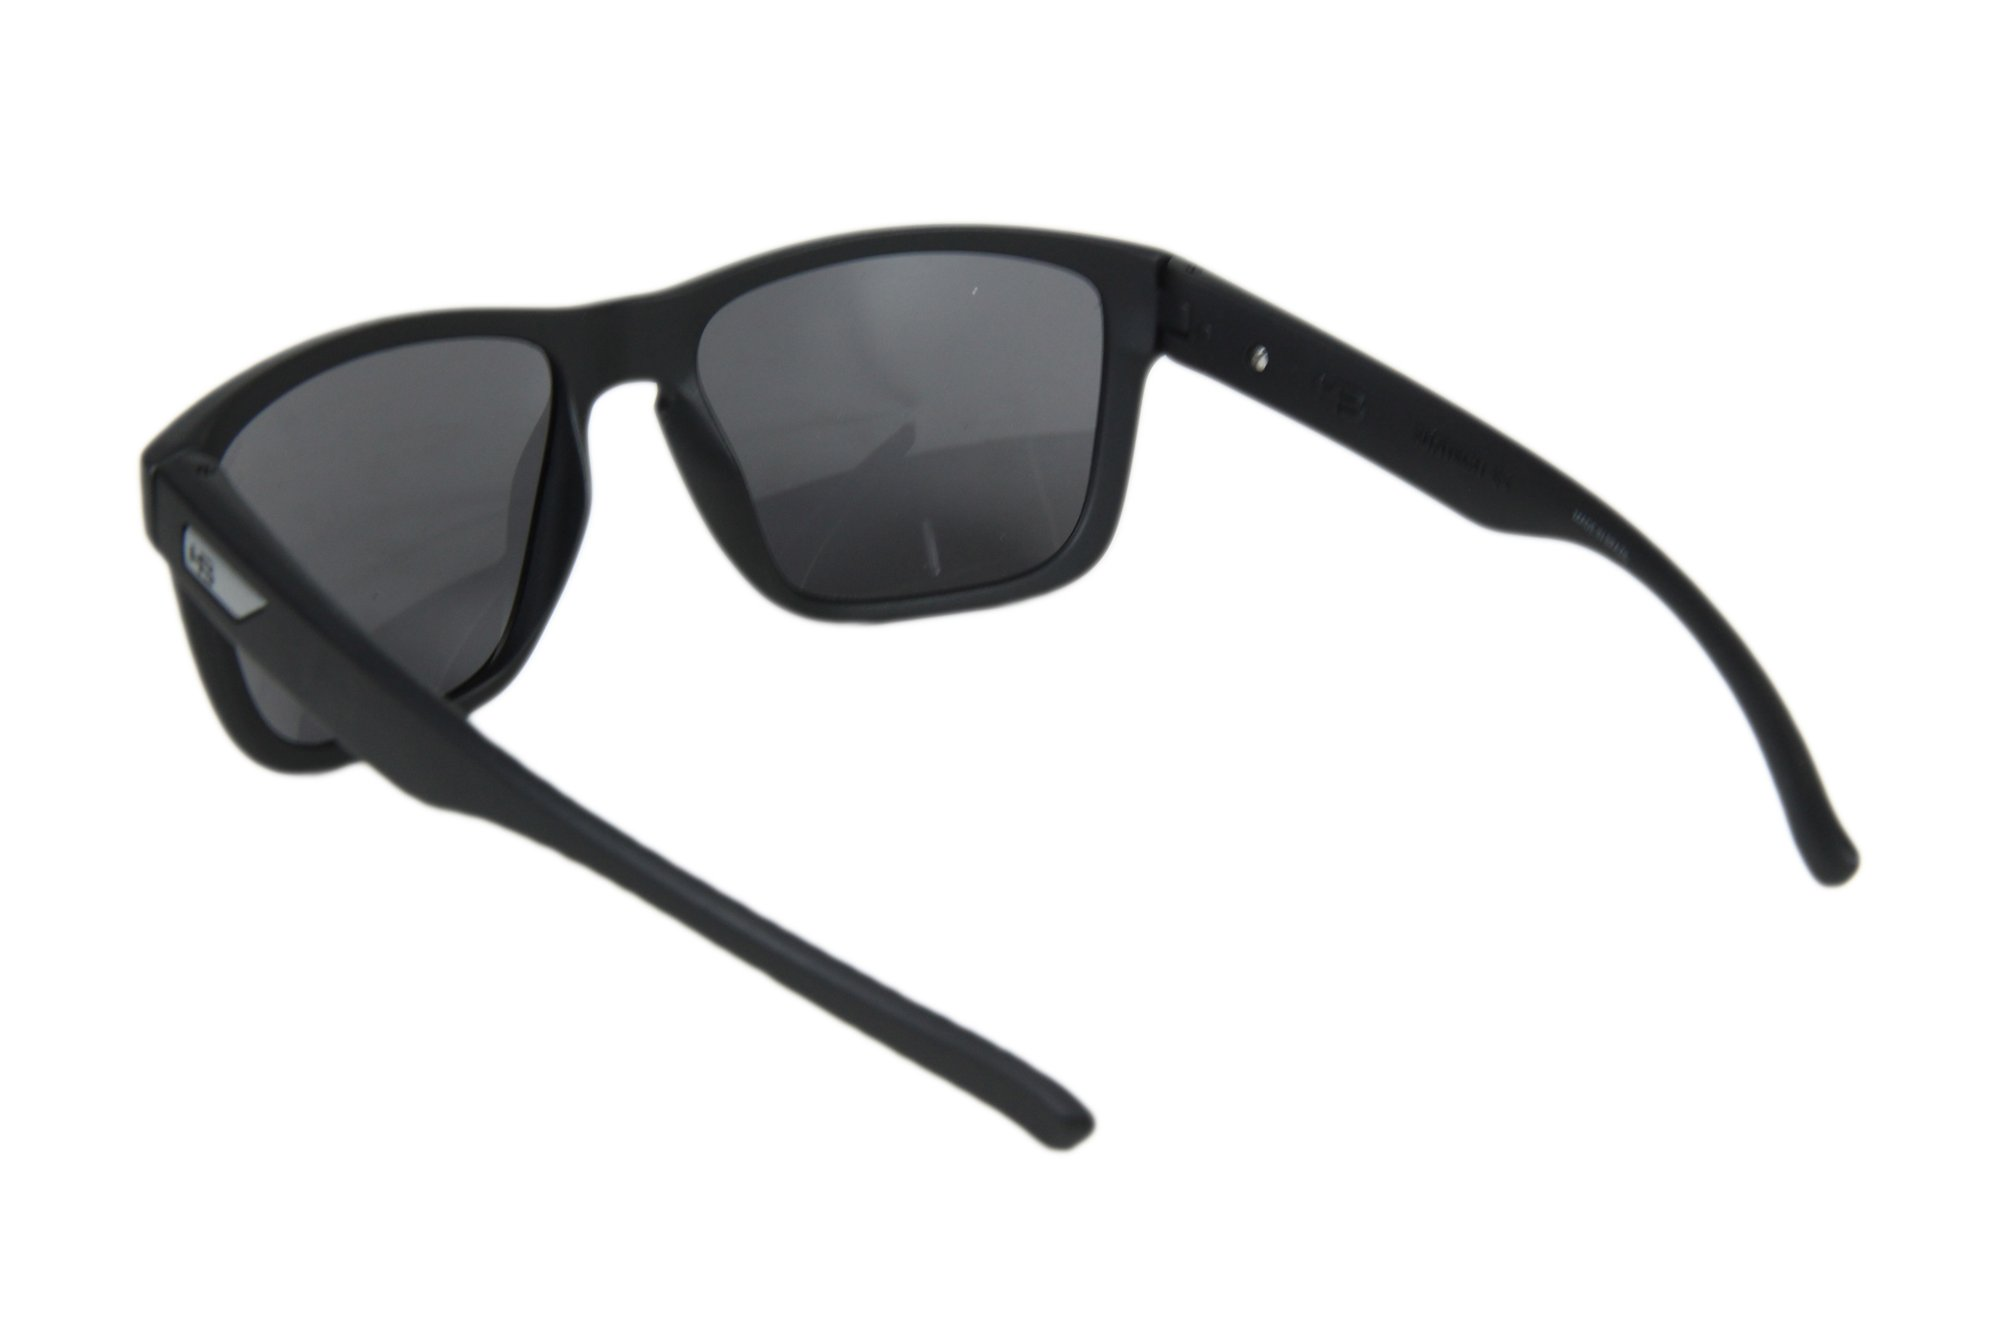 a8fe4f356b999 Óculos HB H-Bomb Gray Lenses - Black White - Session Store